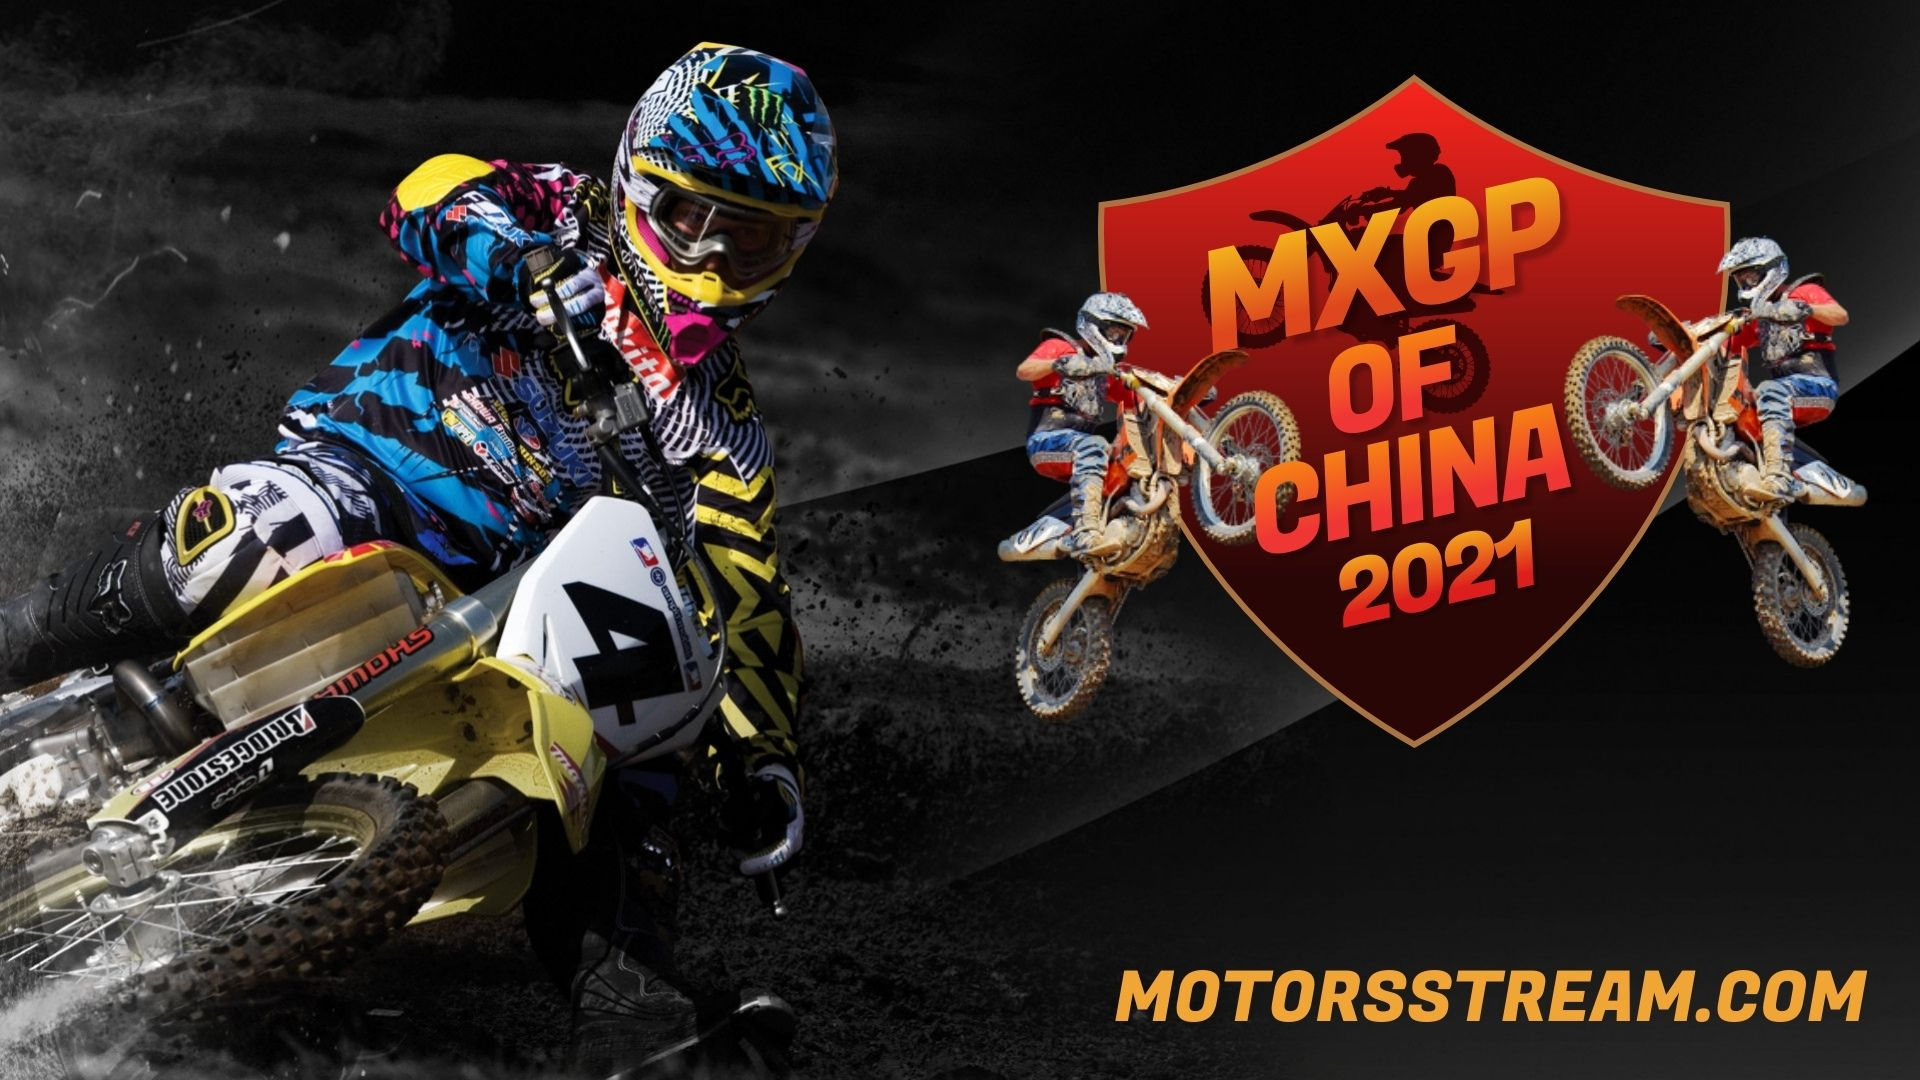 FIM Motocross WC China Live Stream 2021 | MXGP